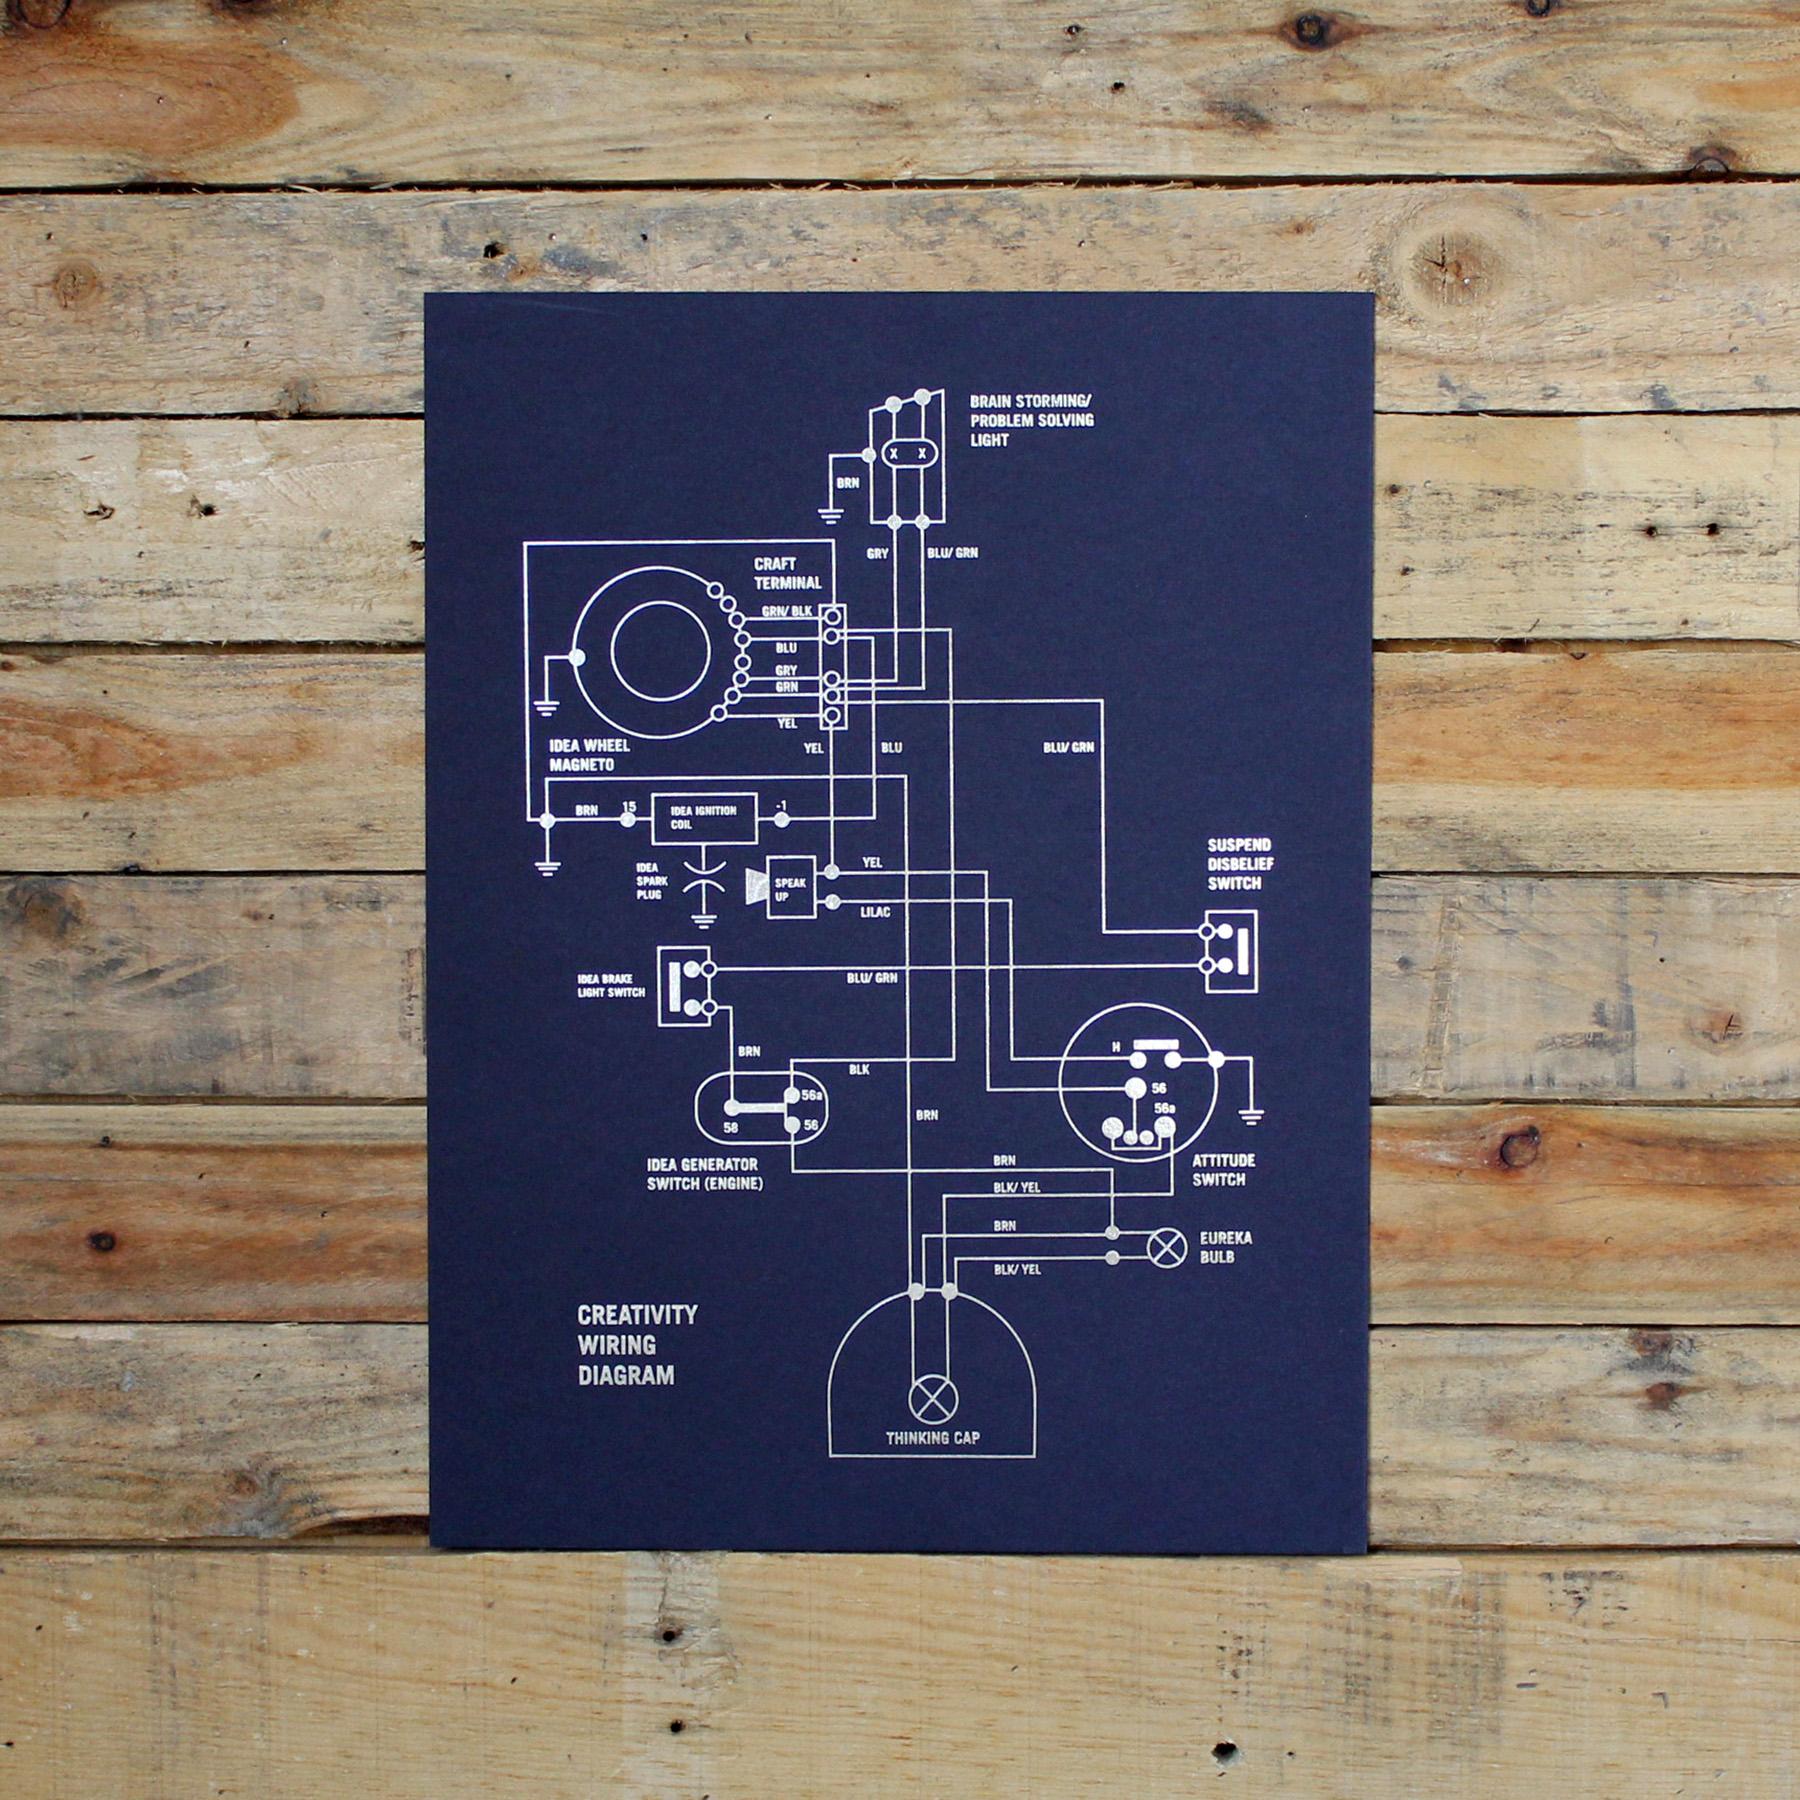 creativity wiring diagram vincent lai prev next [ 1500 x 1500 Pixel ]